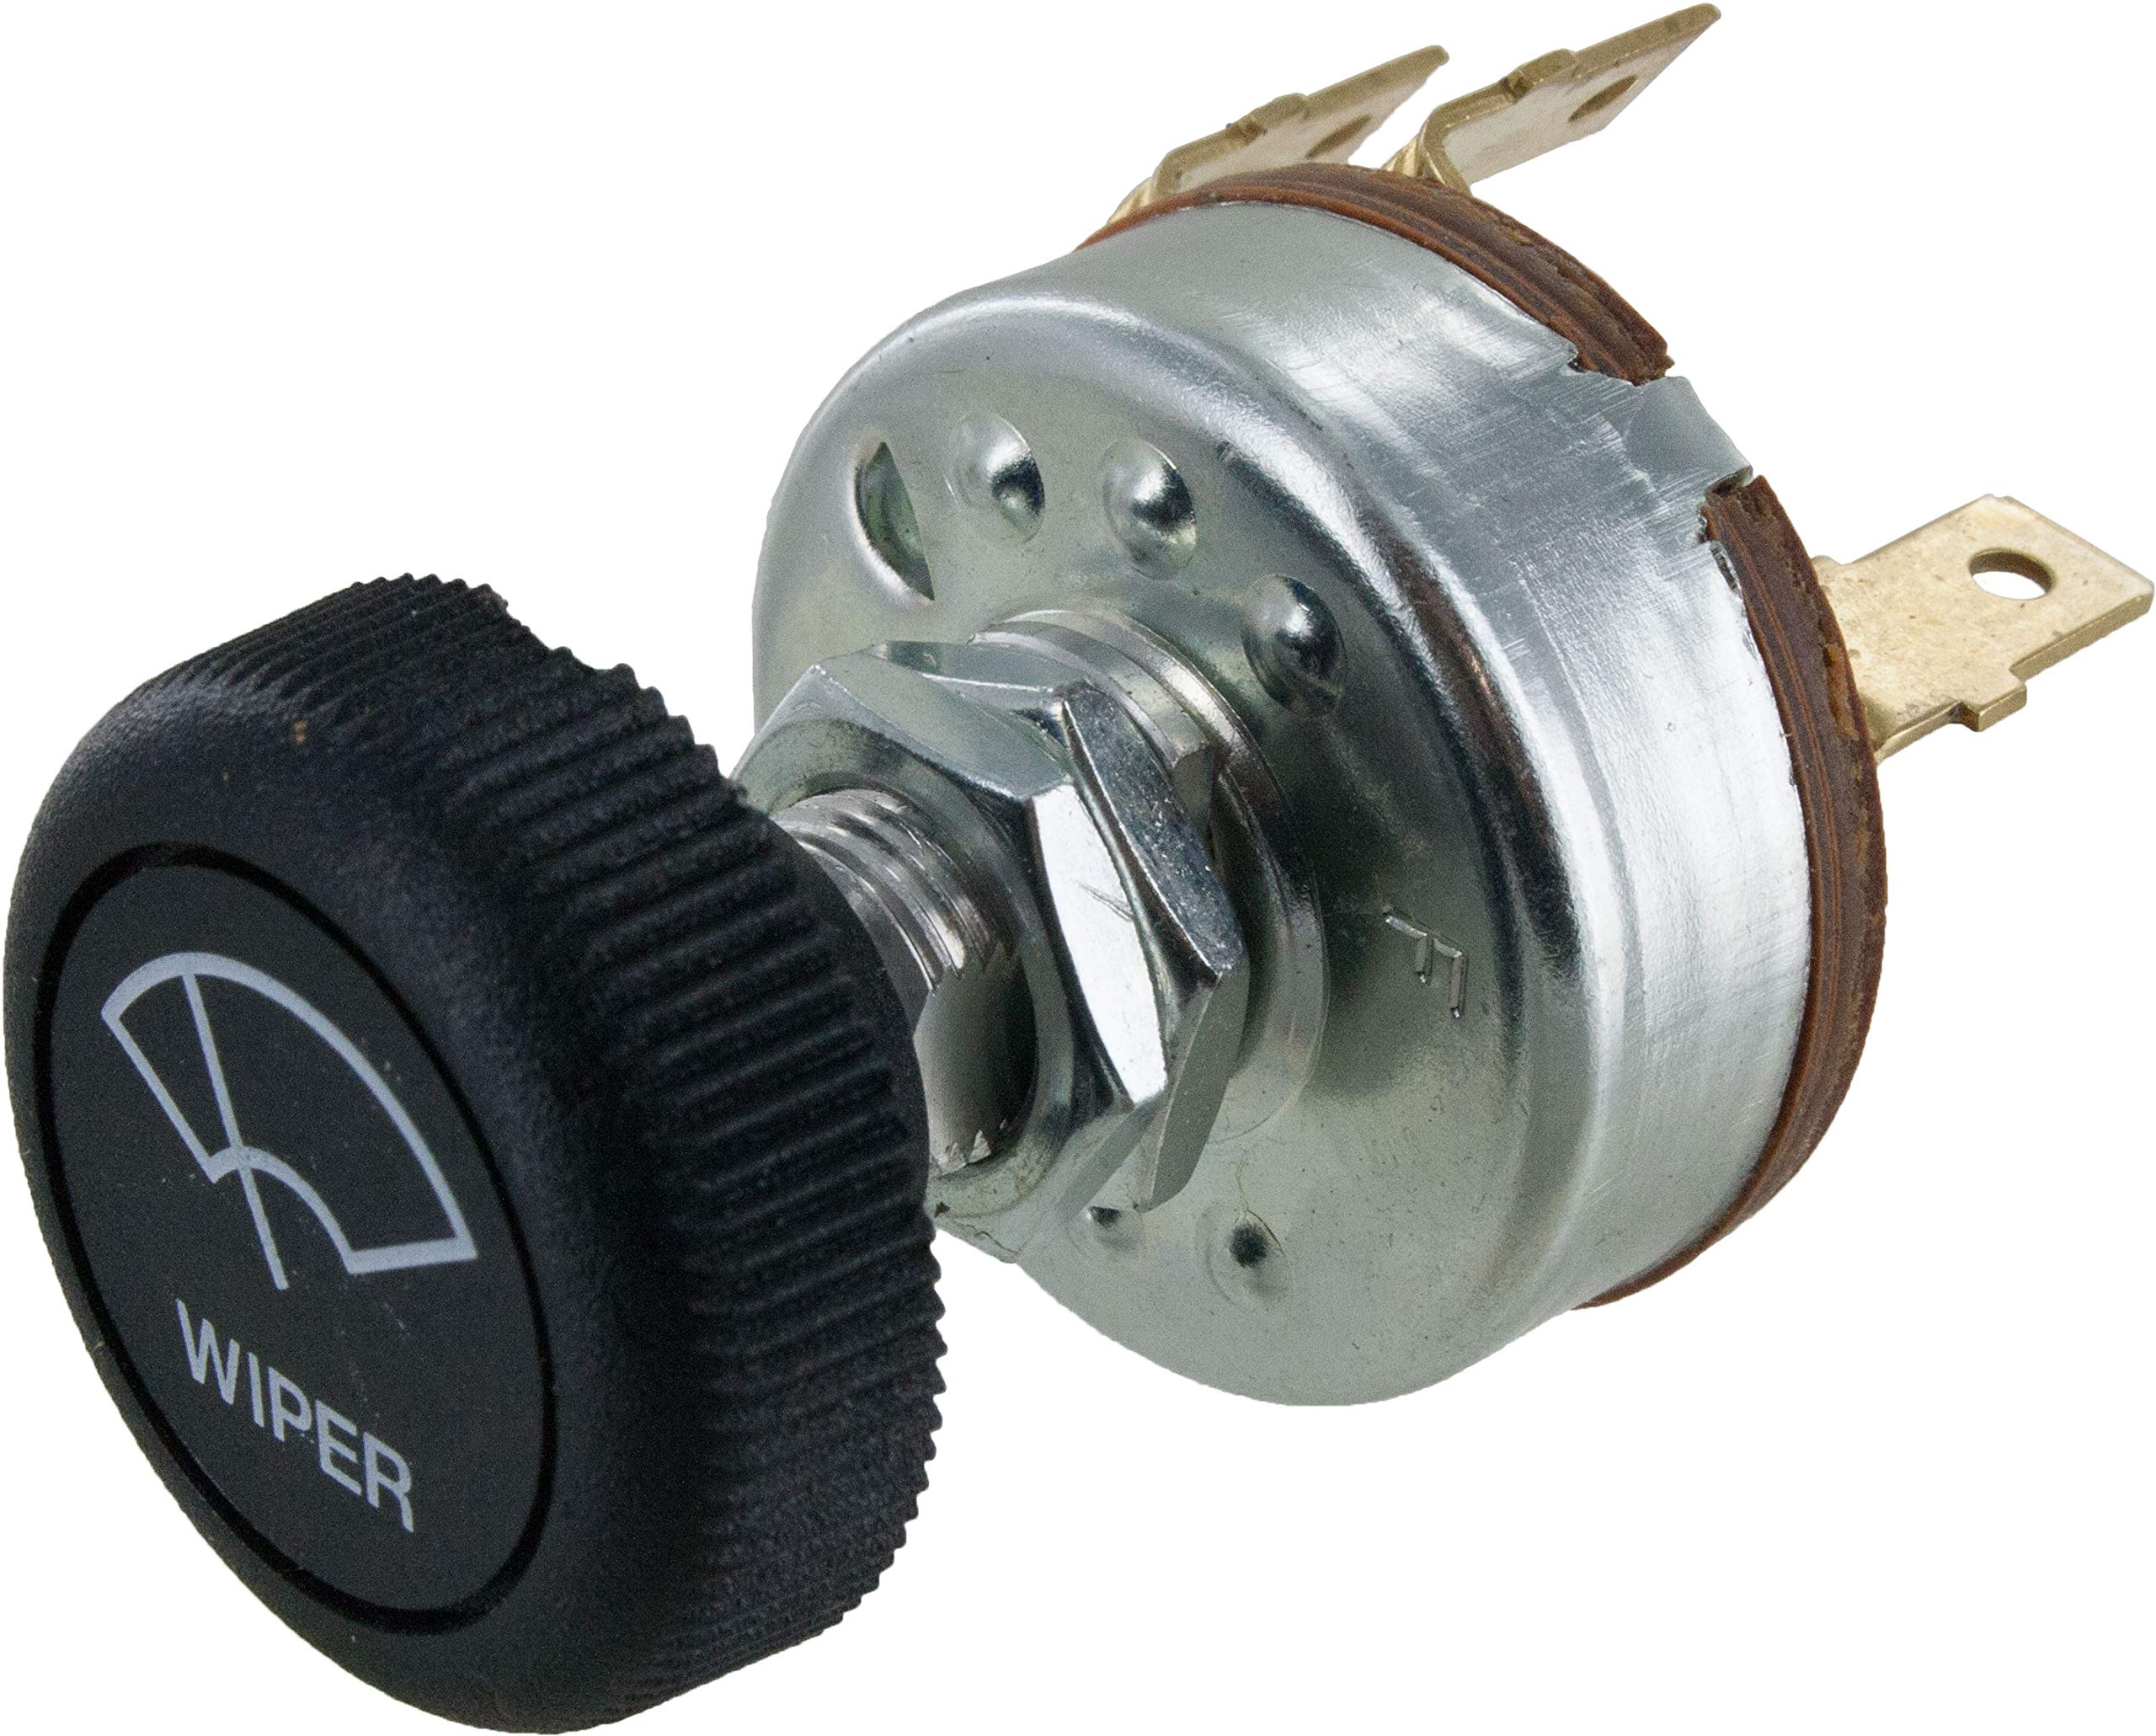 Dts New Universal Windshield Wiper Motor Switch w